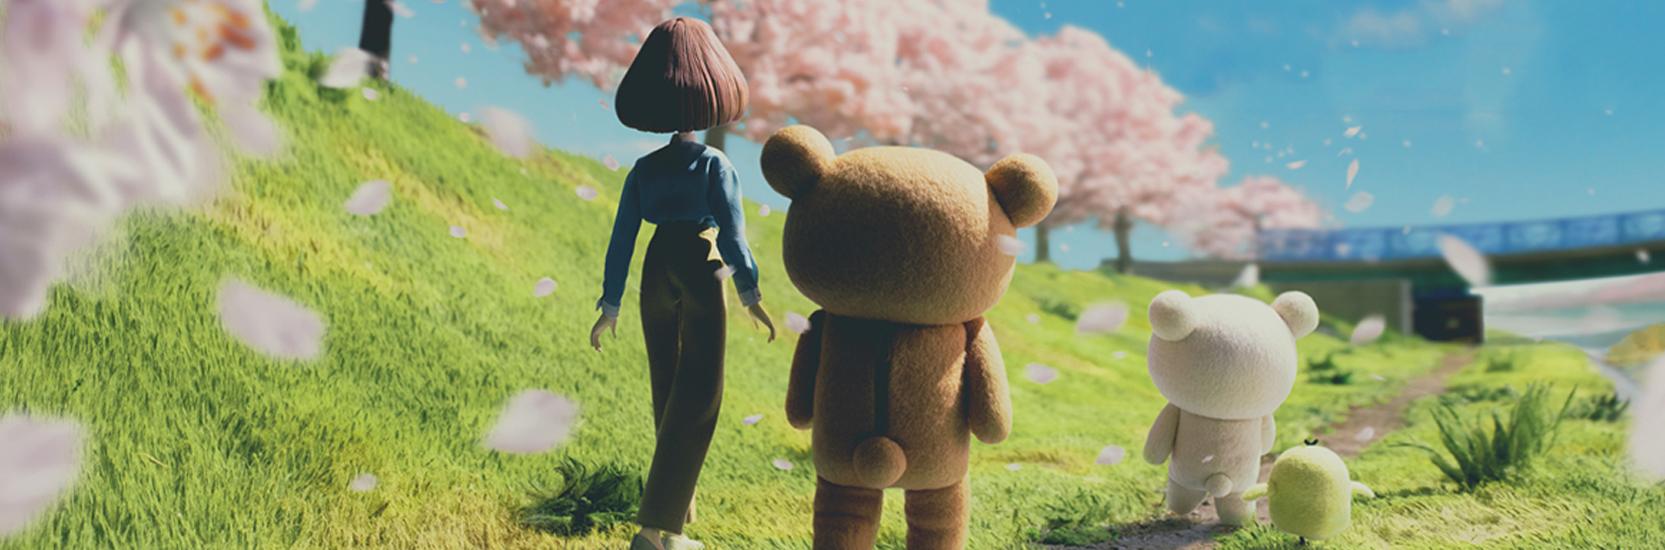 Critique – Rilakkuma et Kaoru, doux totems modernes